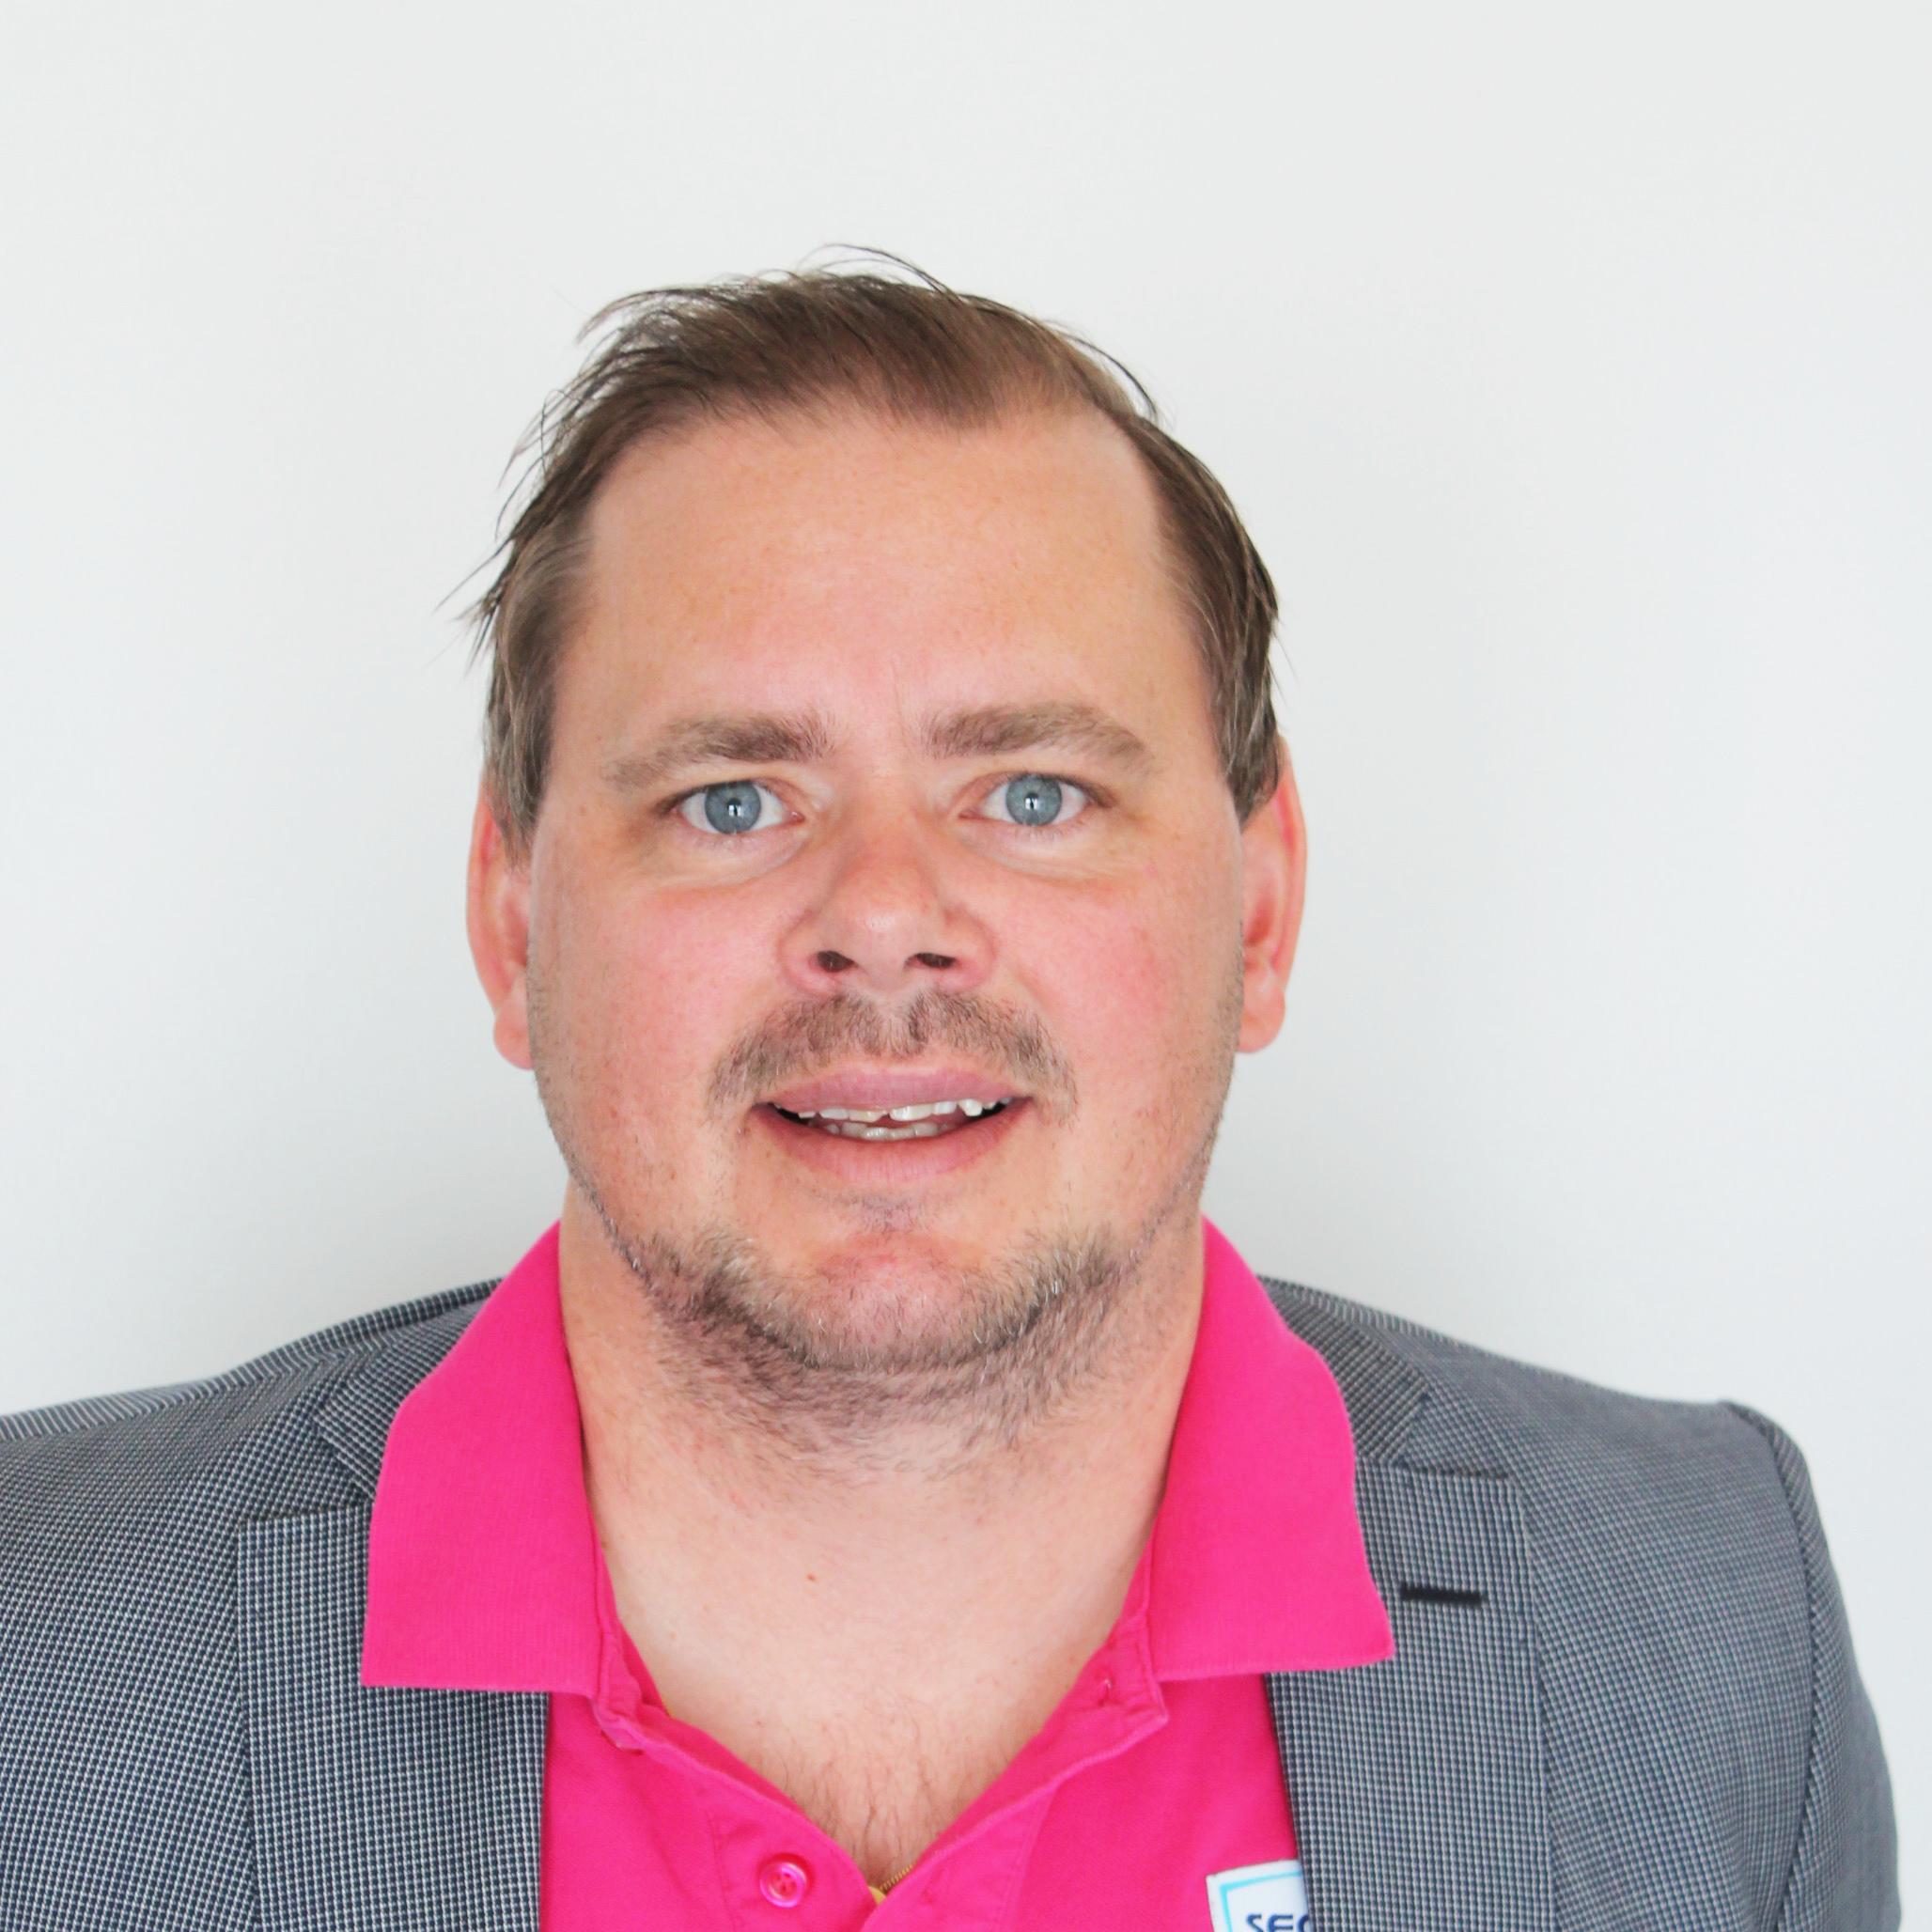 Mikael Söderqvist